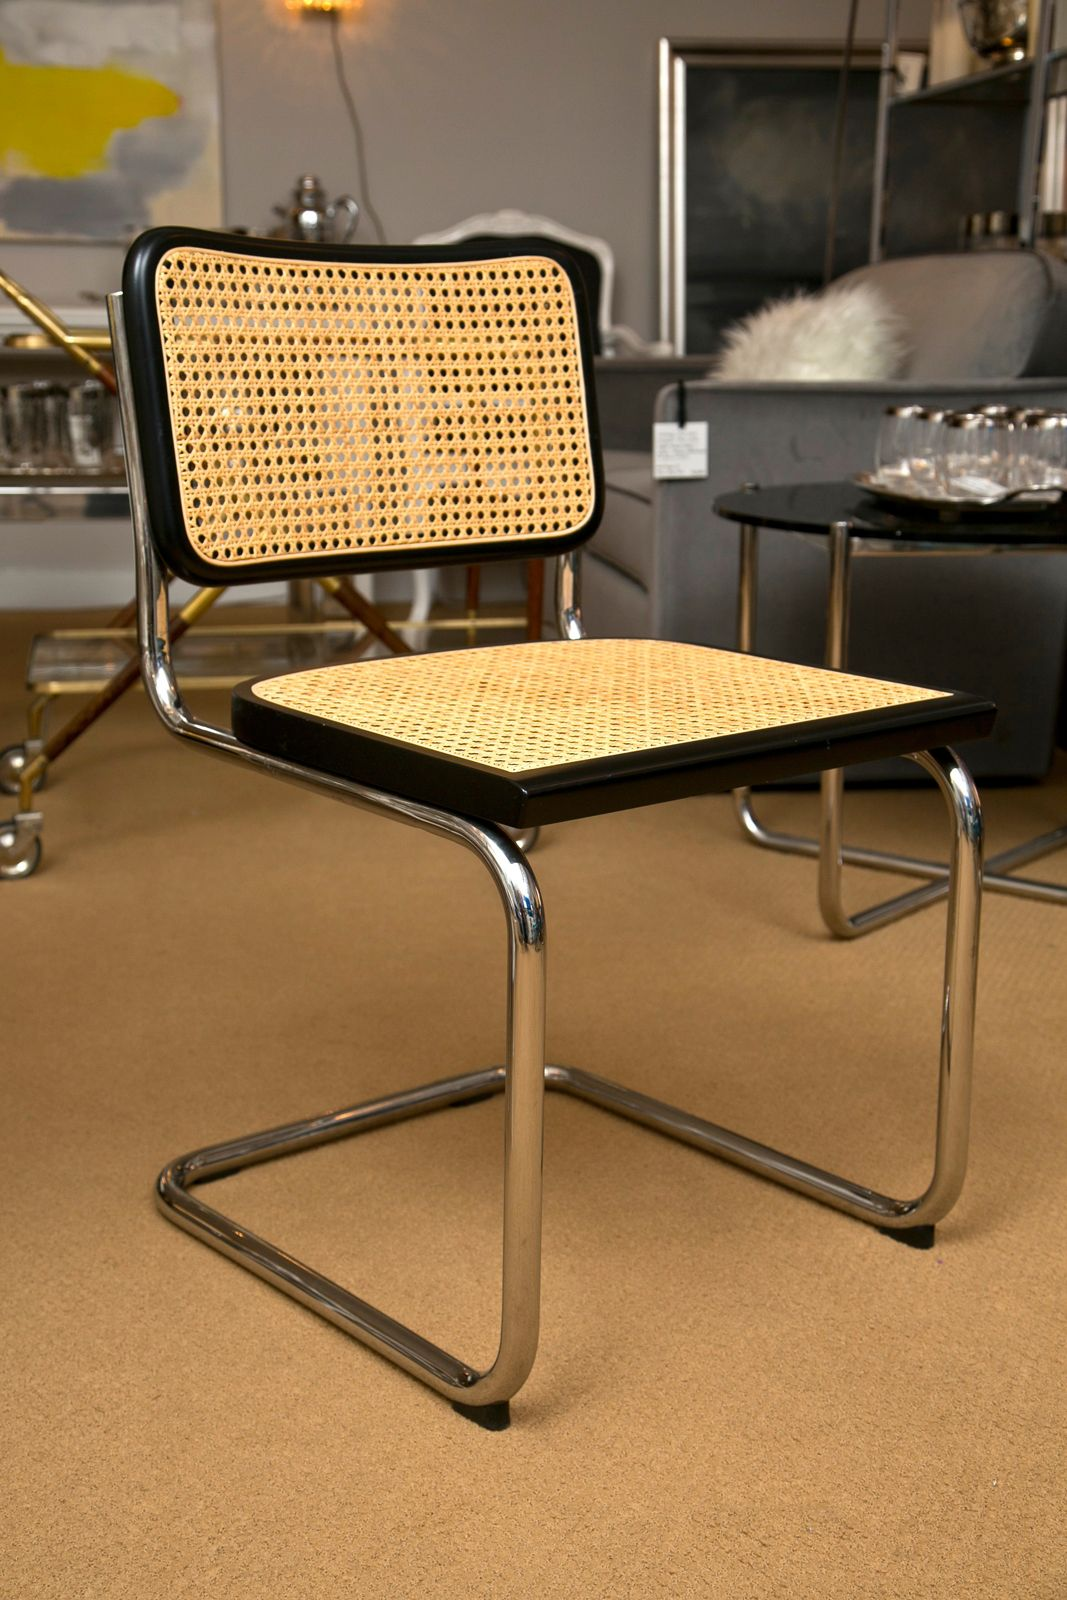 Vintage Cantilever Cesca Chair Mod Modernist Decor Two Marcel Breuer Style Side Chairs 1970s Furniture Bauhaus Design Mid Century Modern